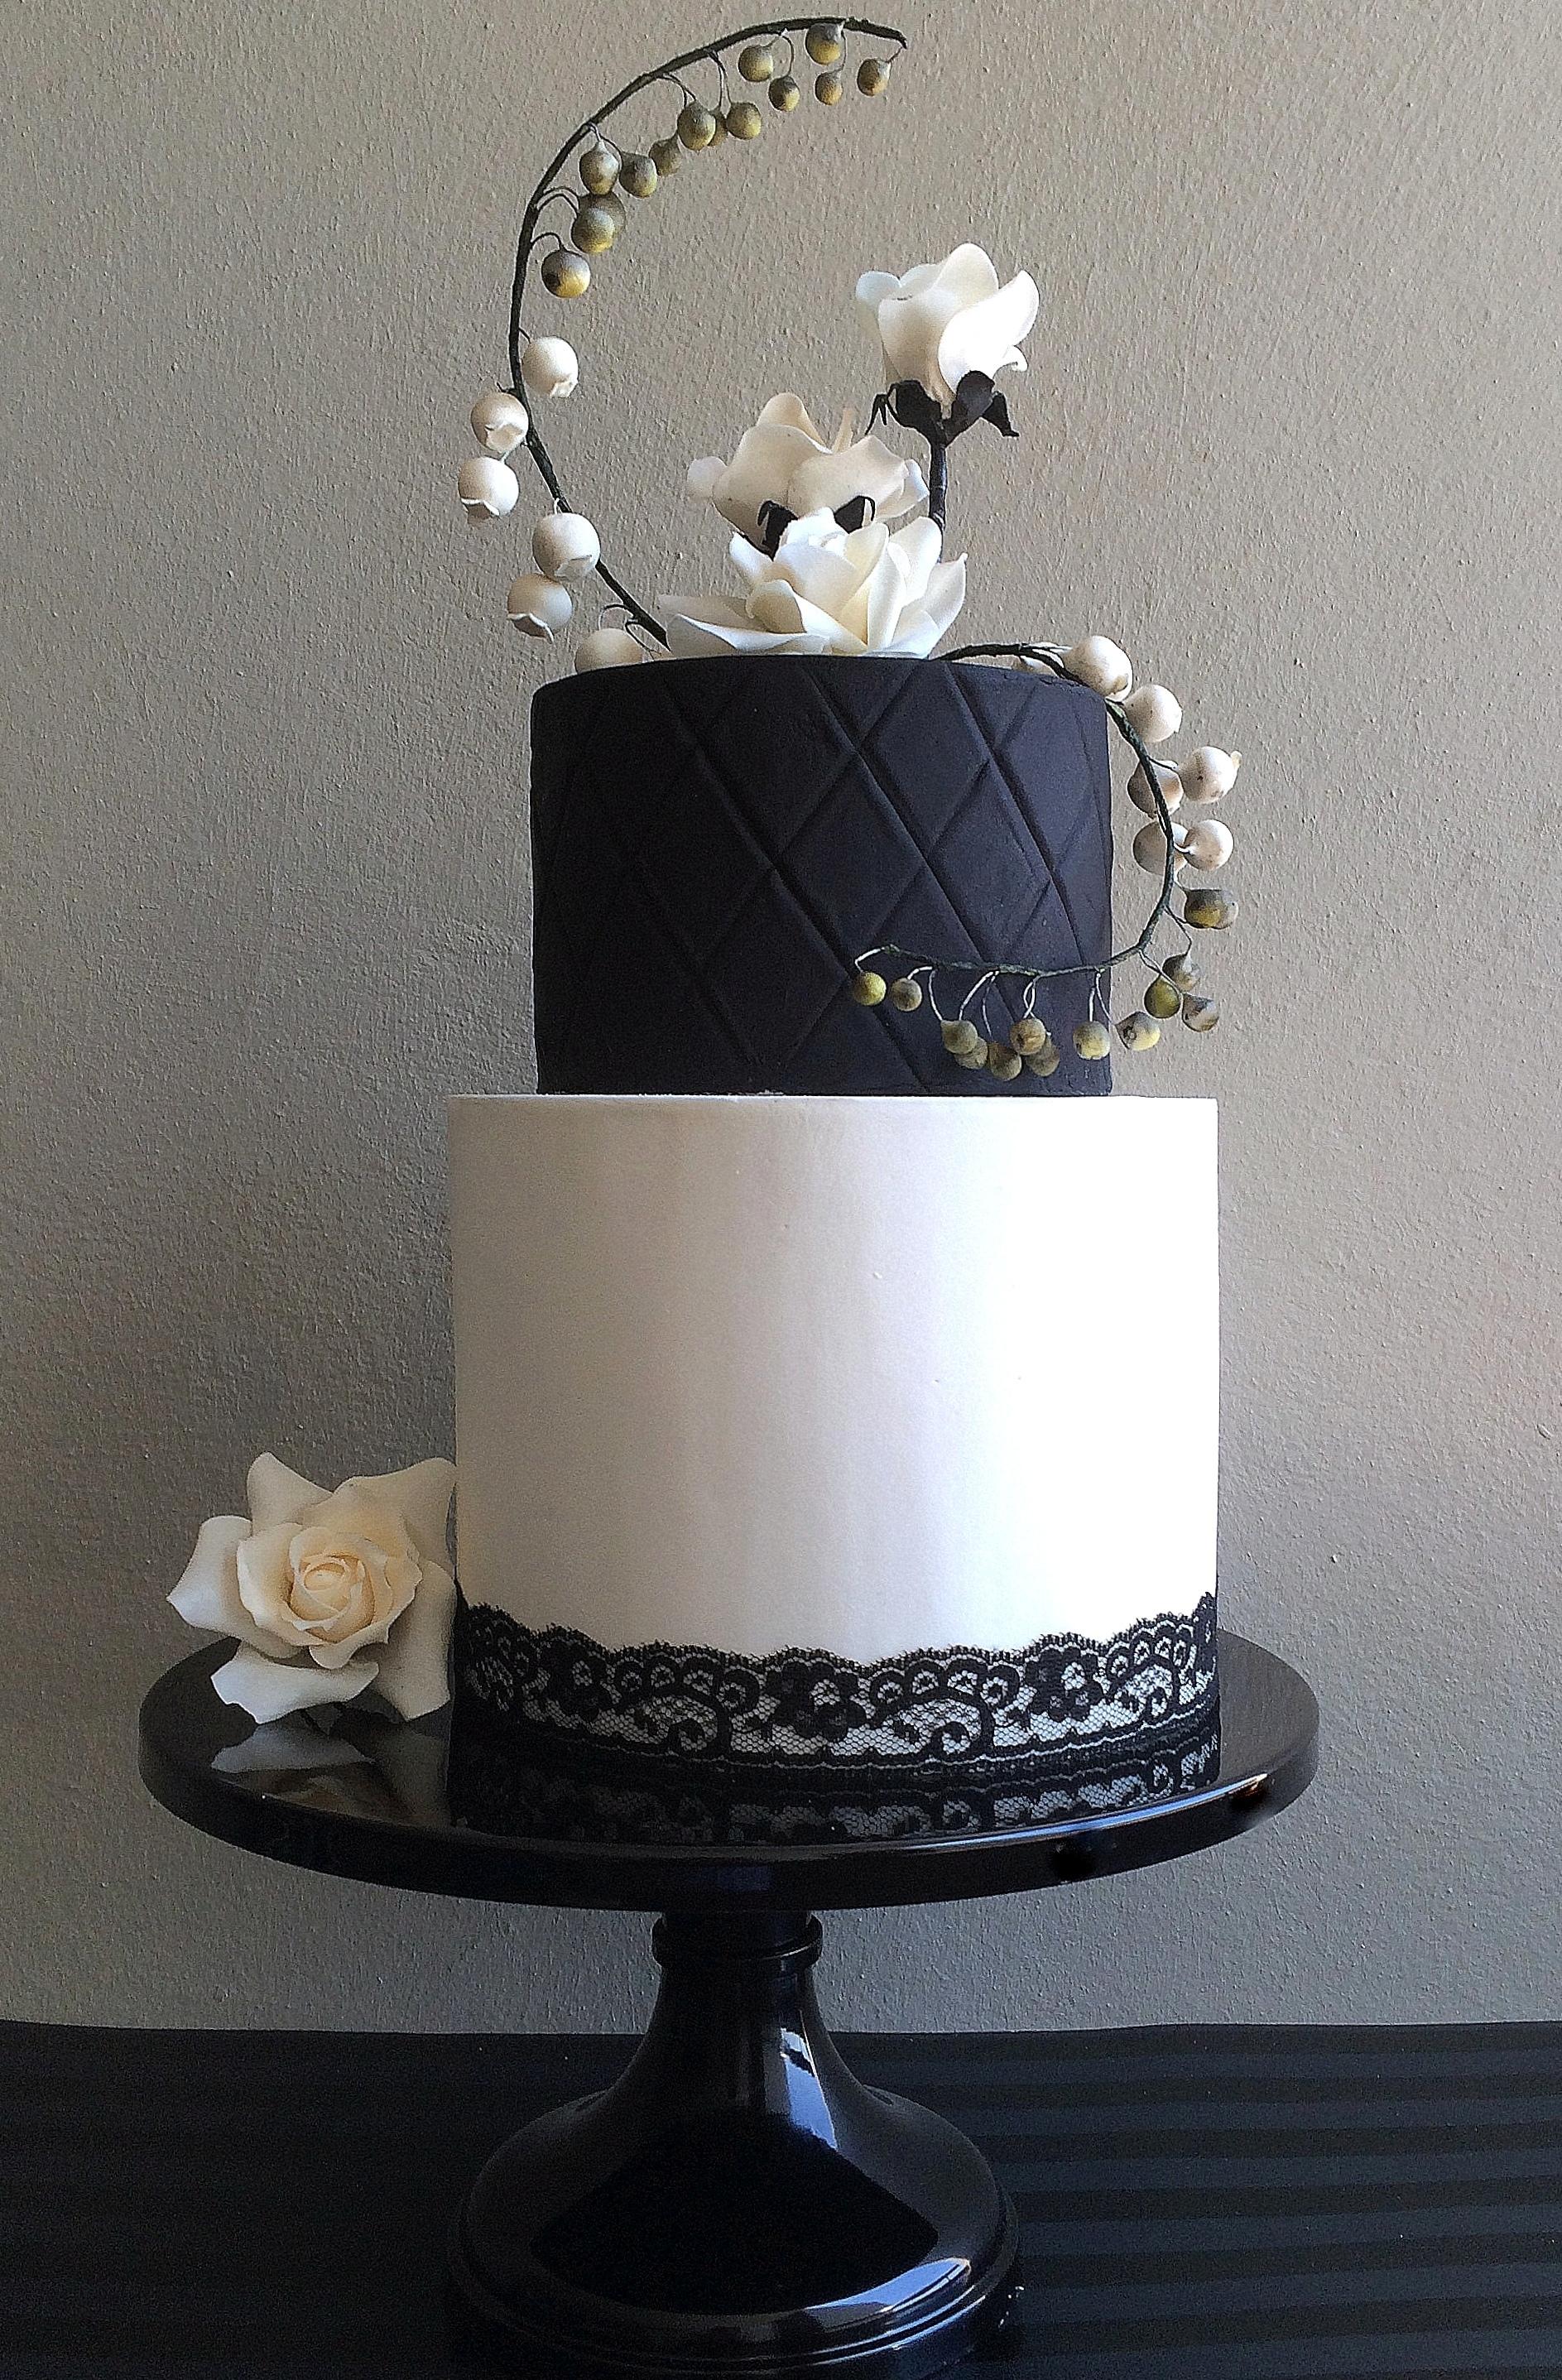 Tina-Scott-Parashar-Tina-Scott-Parashars-Cake-Design-Wedding-Elegant-3-2.jpeg#asset:10196